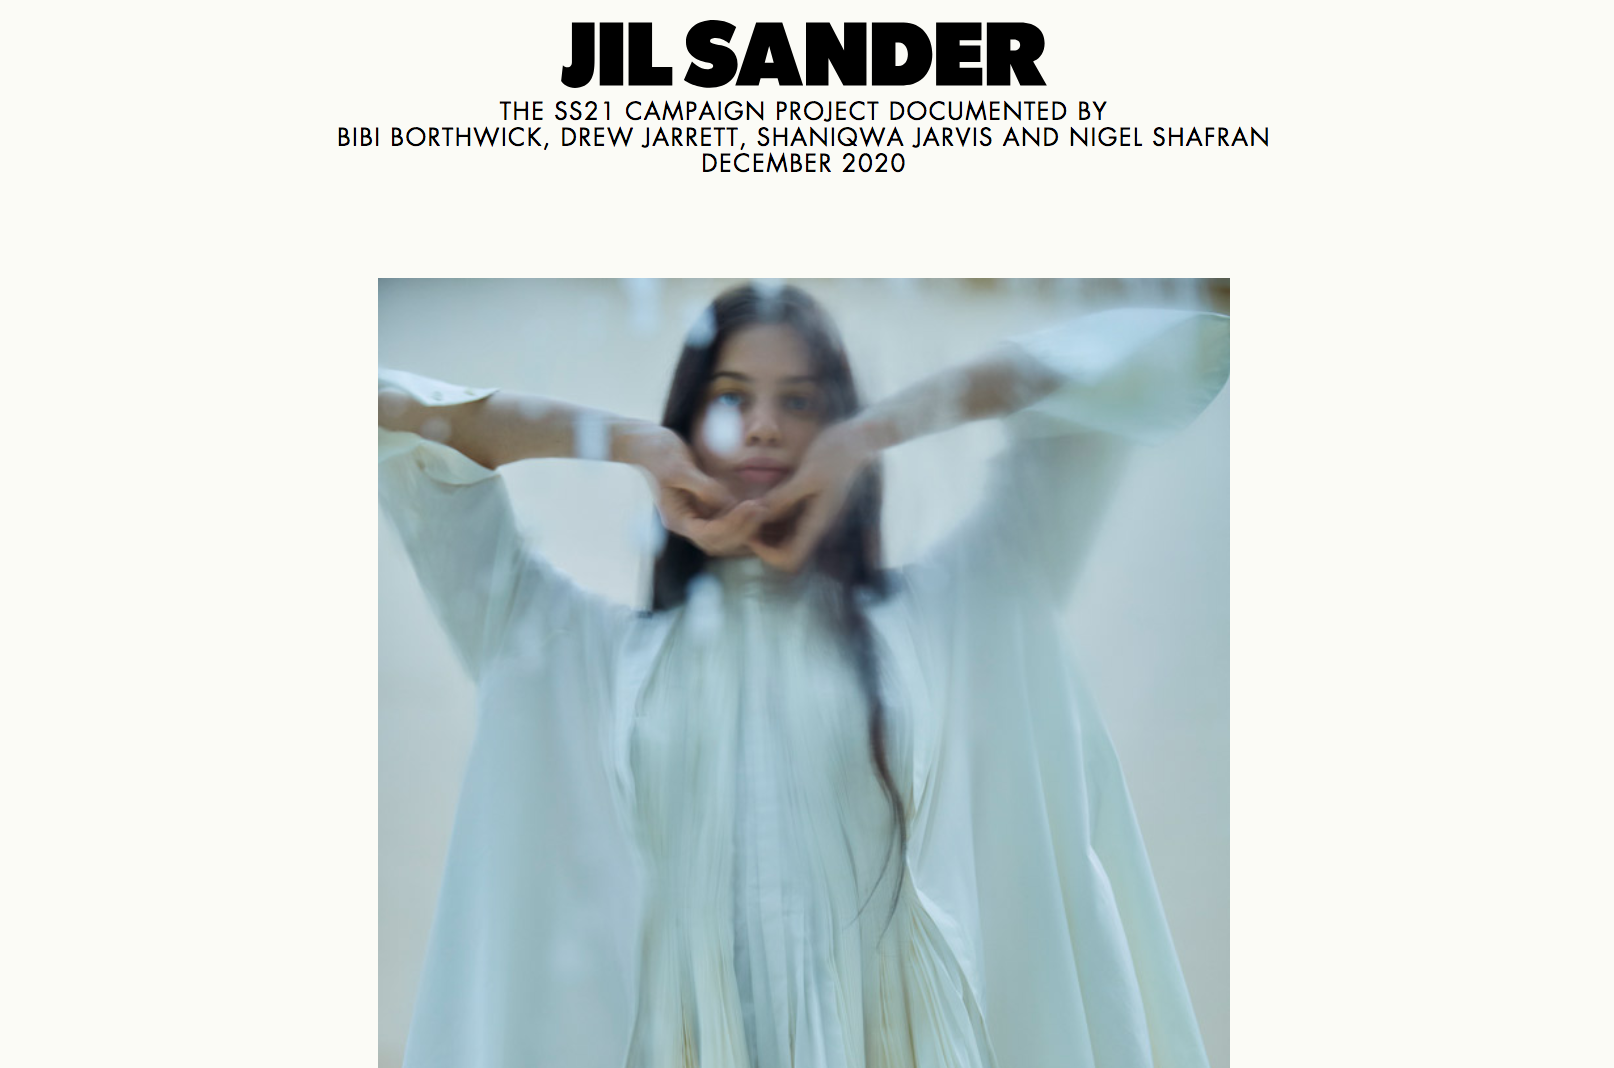 Jil Sander 品牌被意大利OTB集团收购,将与 Maison Margiela、Diesel 成为同门